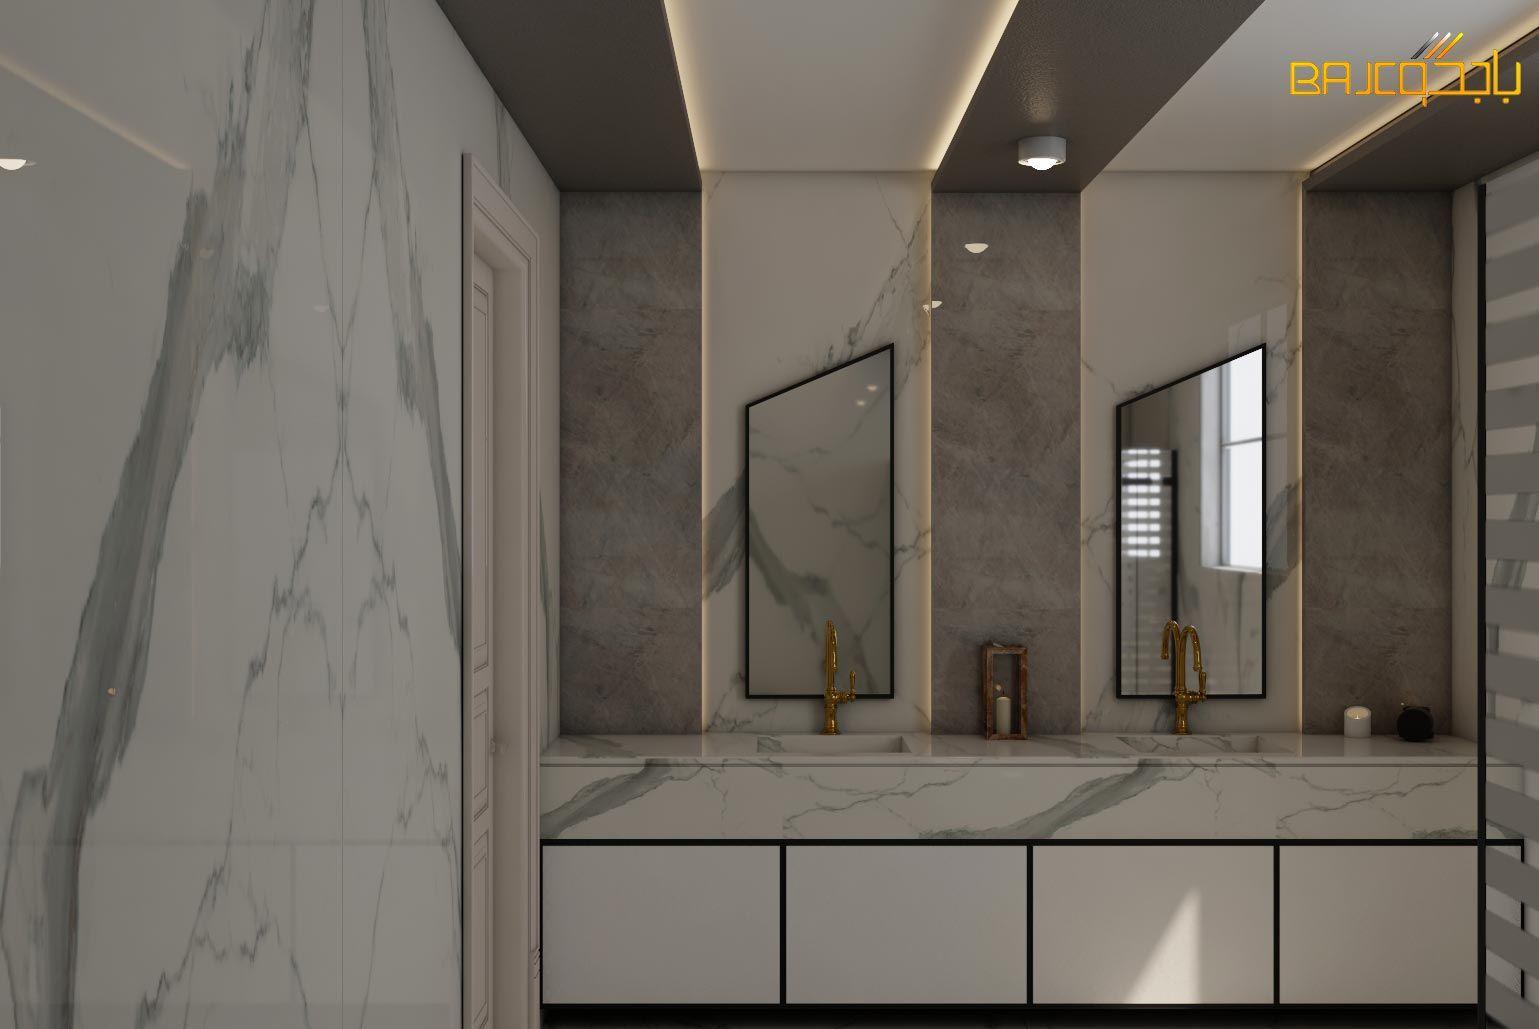 مغاسل رخام Interior Design Lighted Bathroom Mirror Design